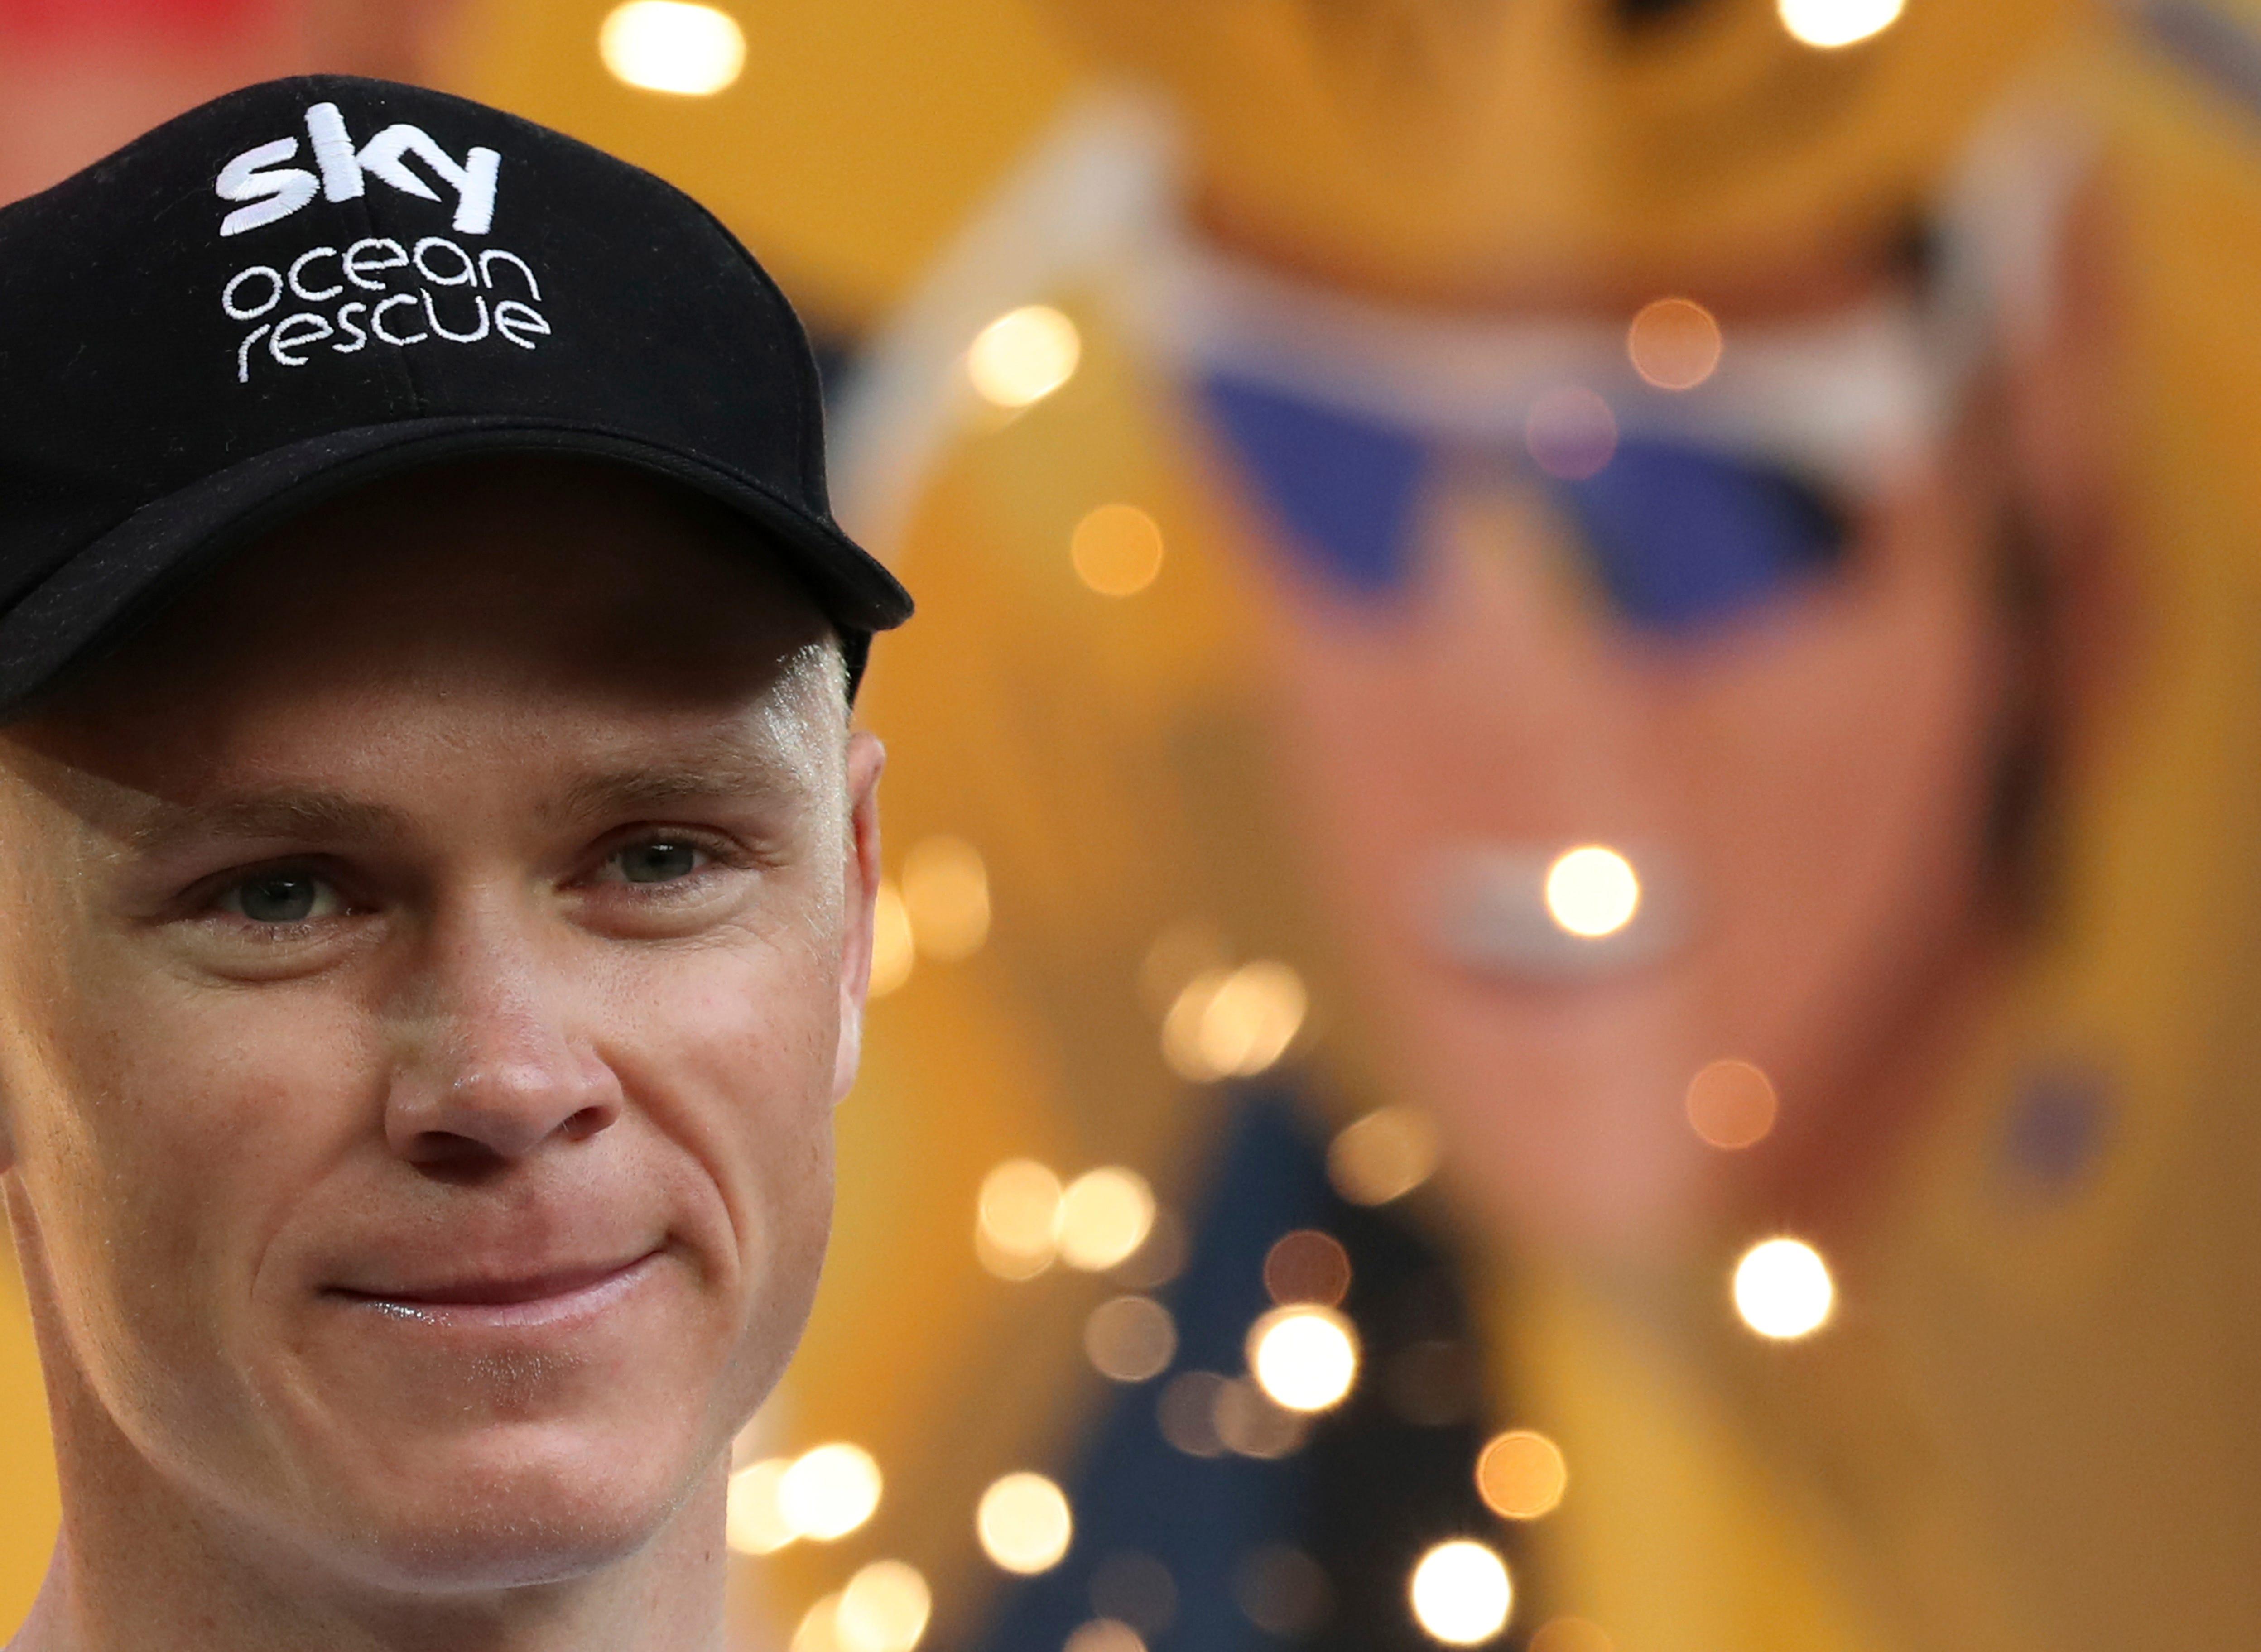 Tour de France director calls